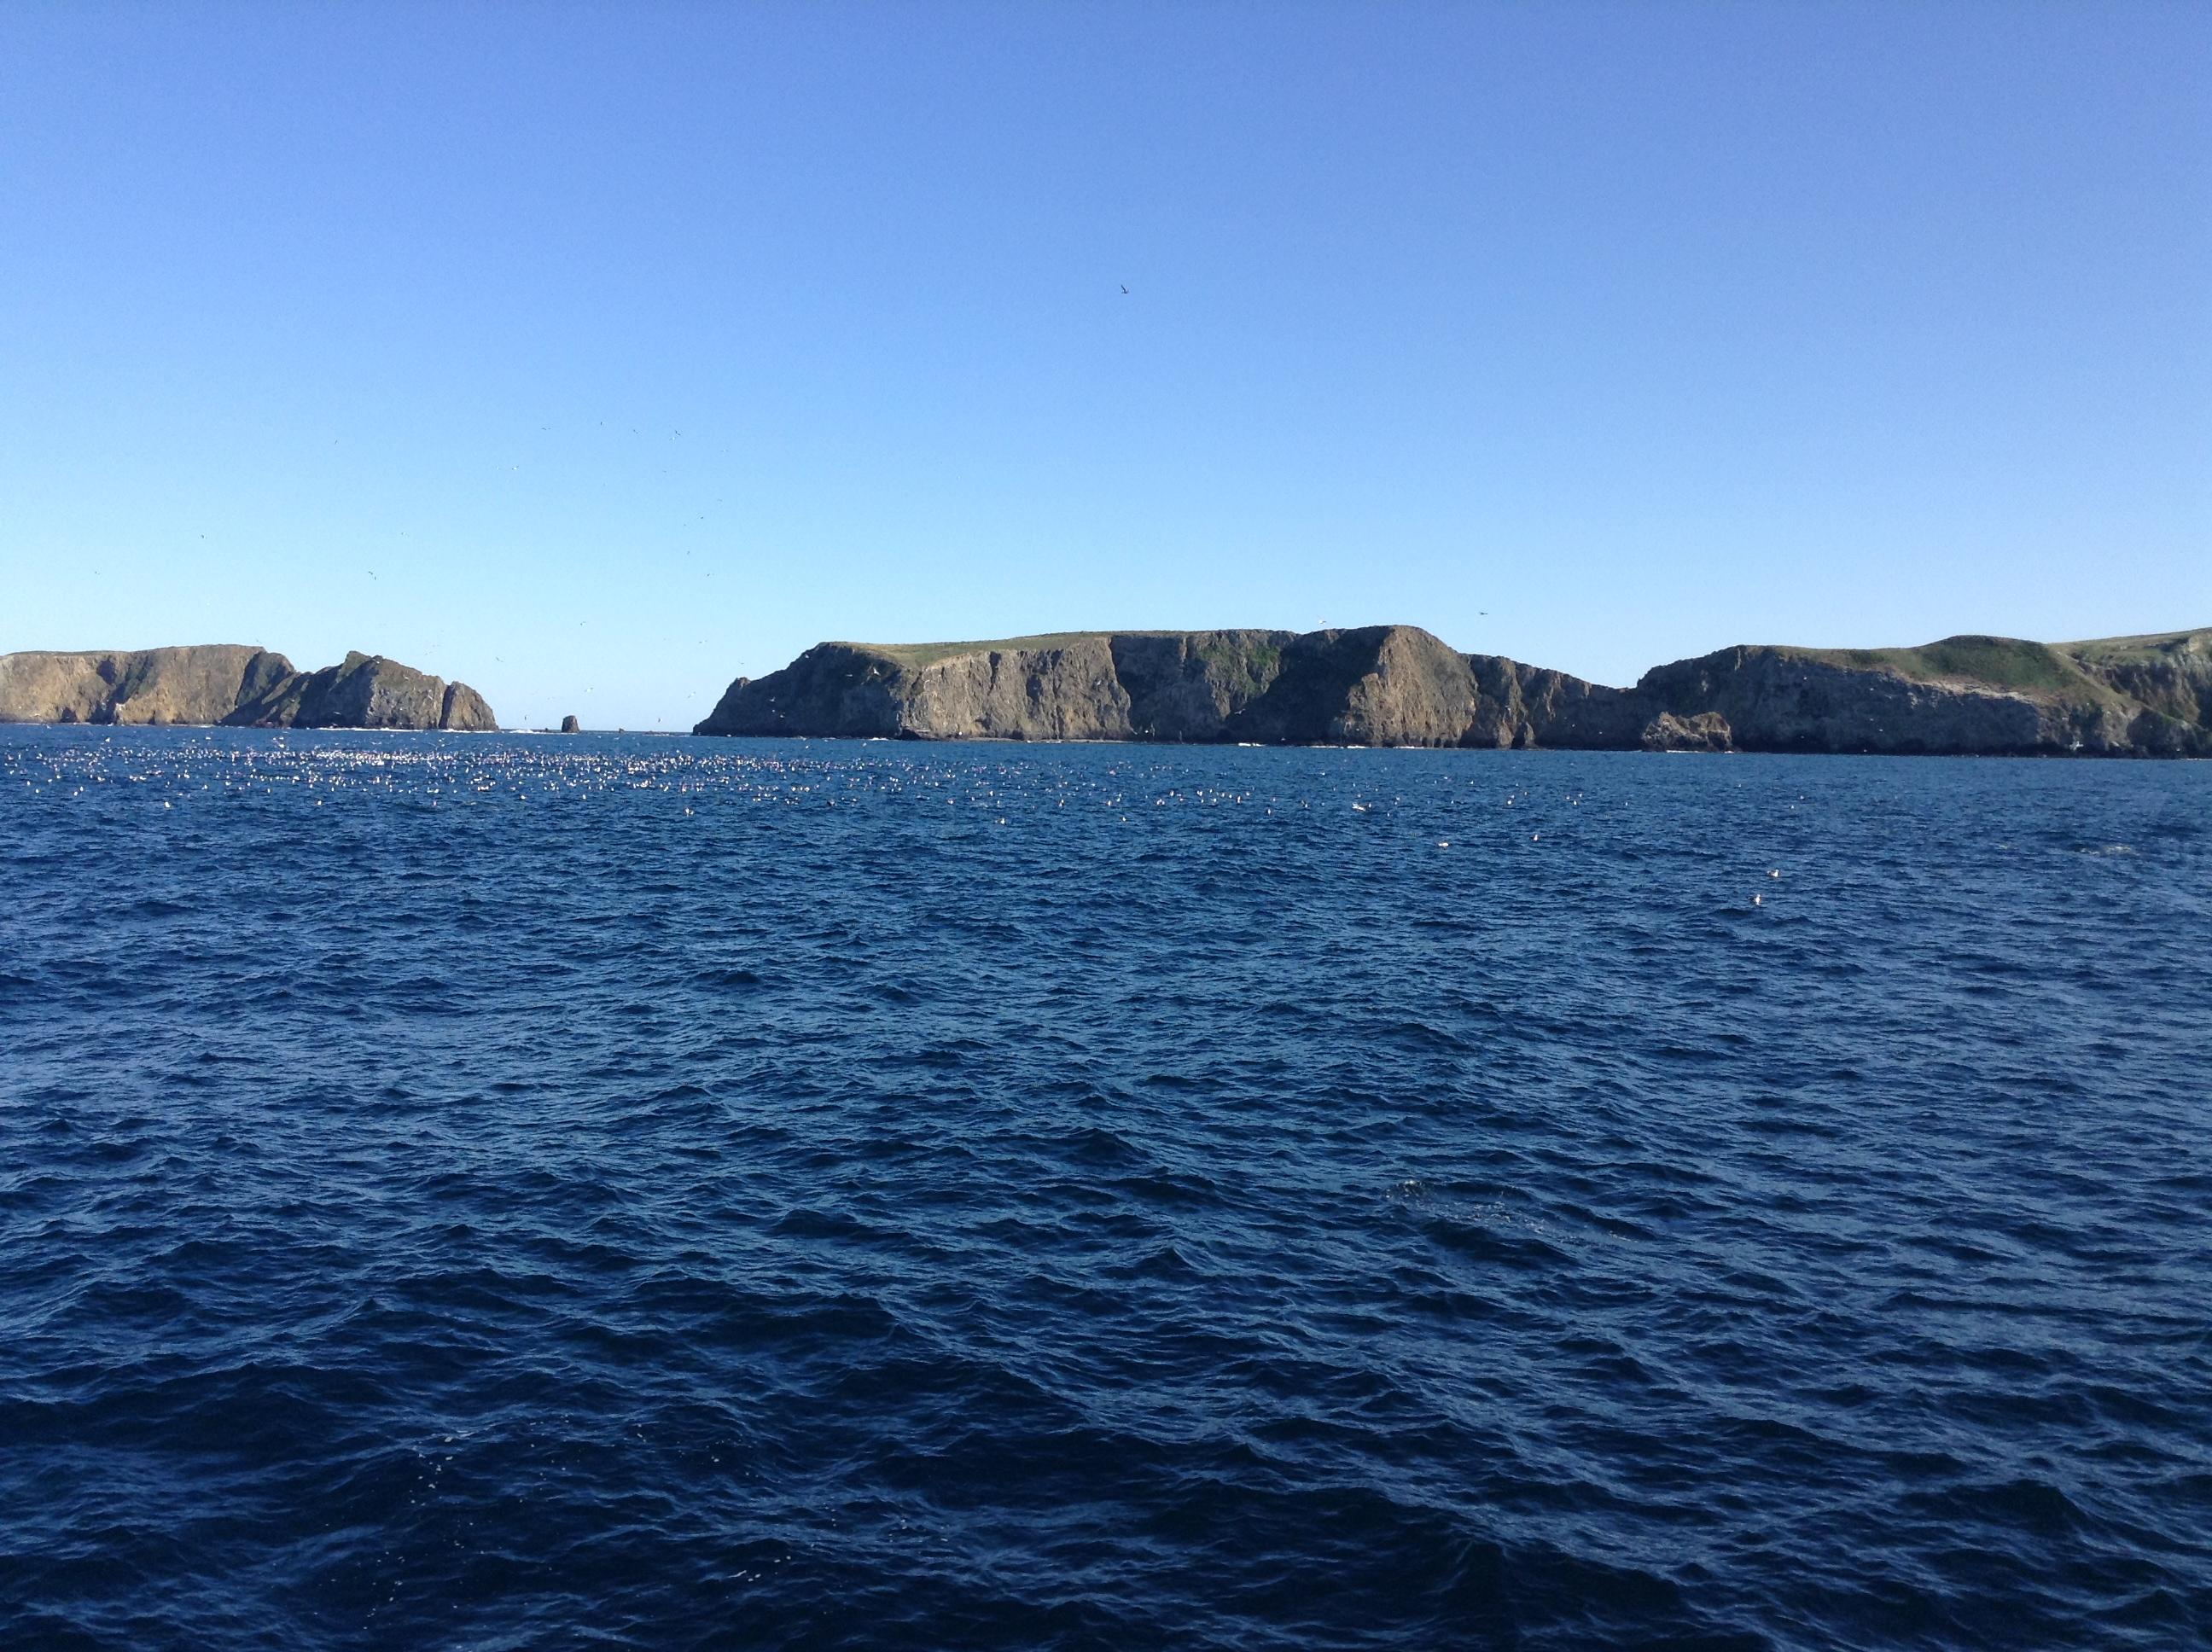 Channel Islands Cystic Fibrosis Pediatrics